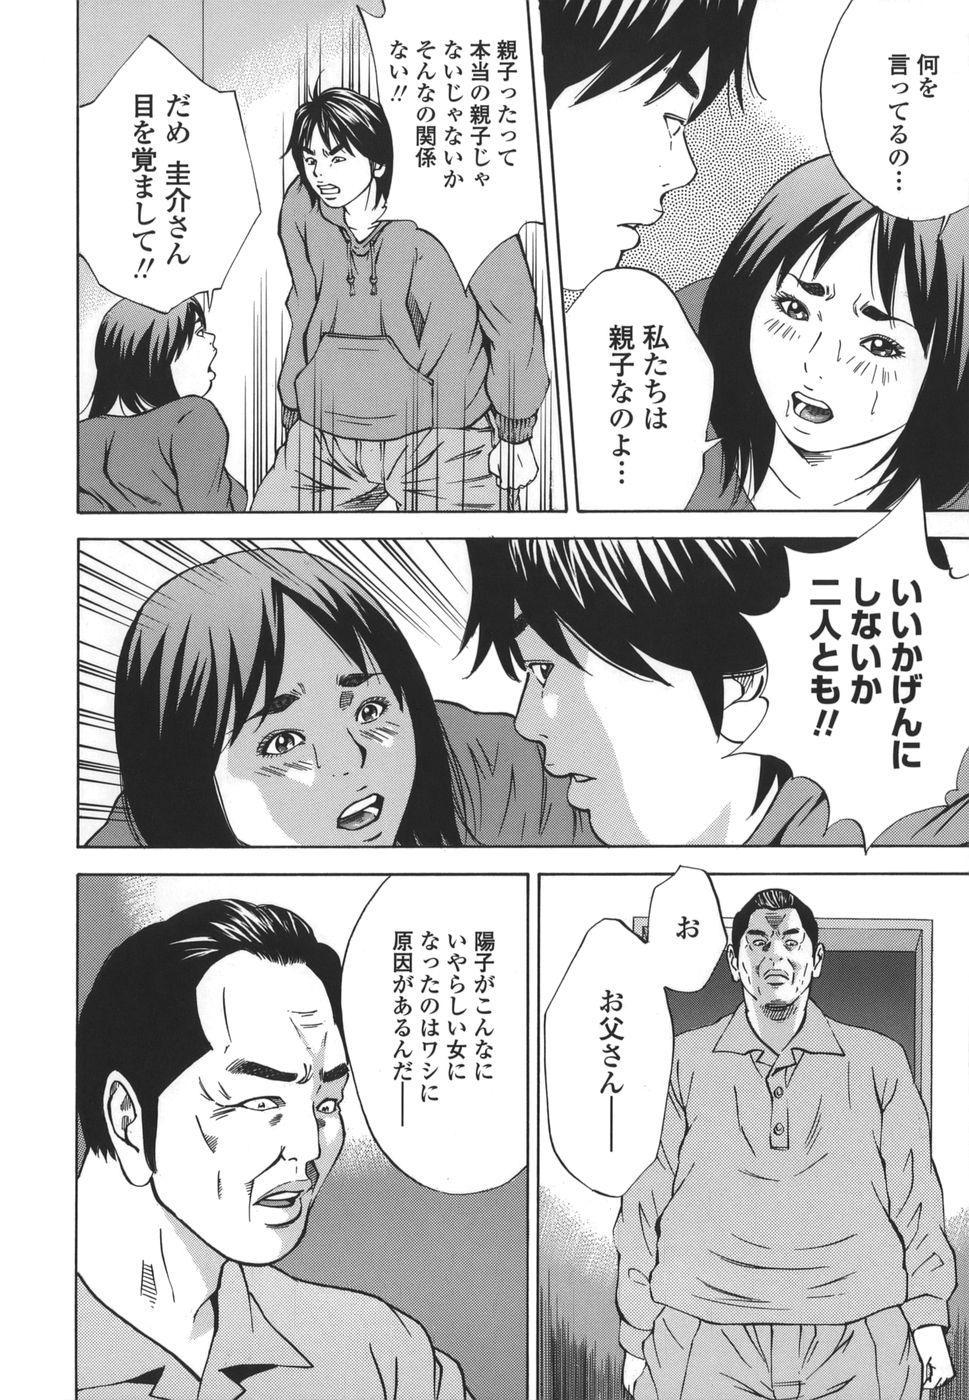 Kinshin Goukan - Near Relation Rapes 193